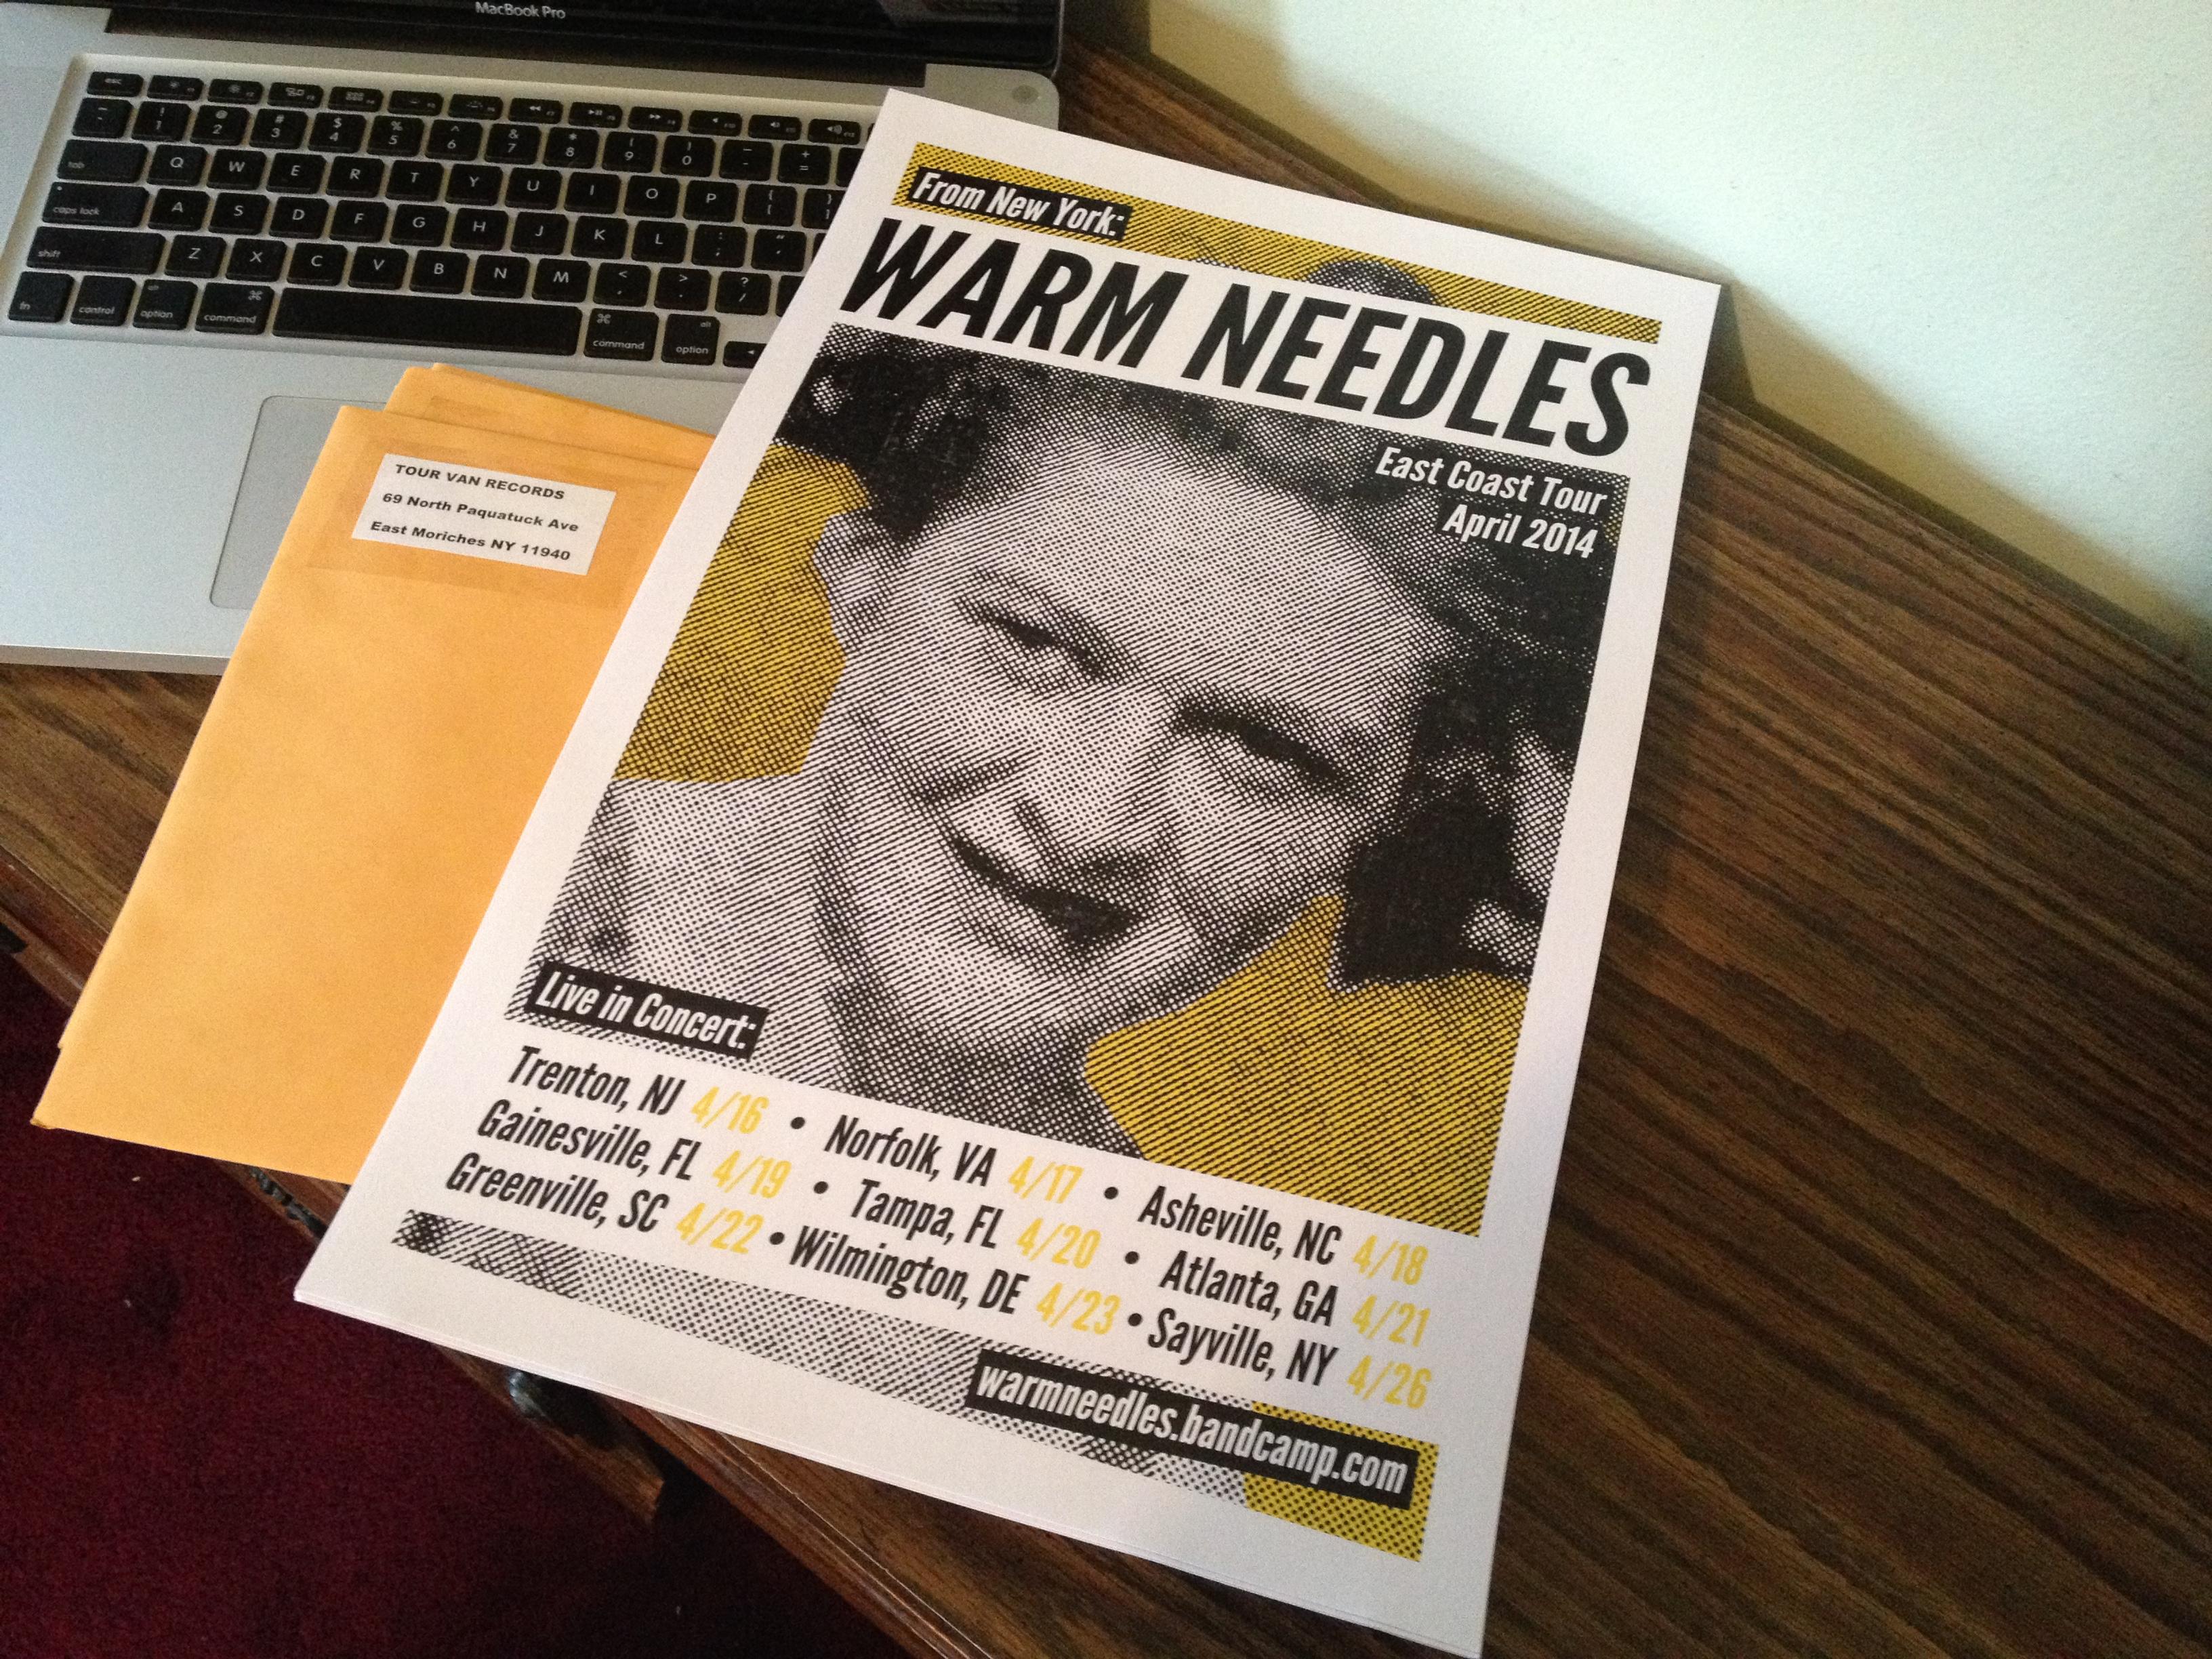 Warm Needles Poster